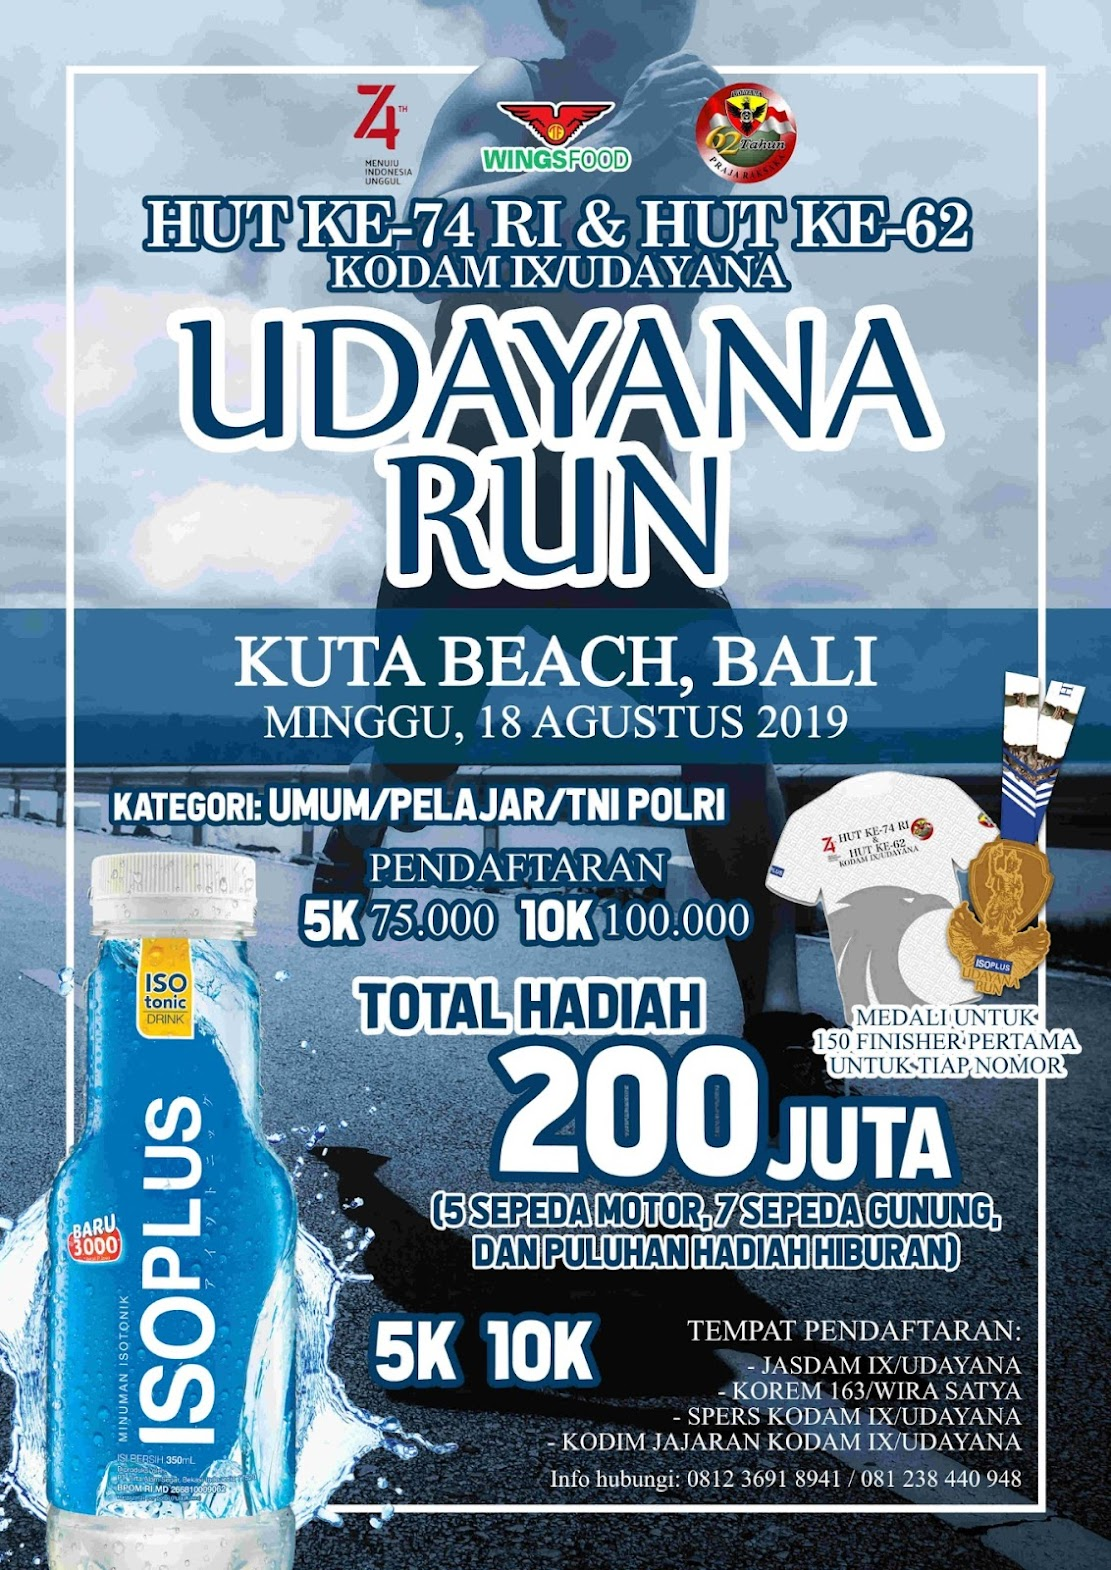 Udayana Run • 2019